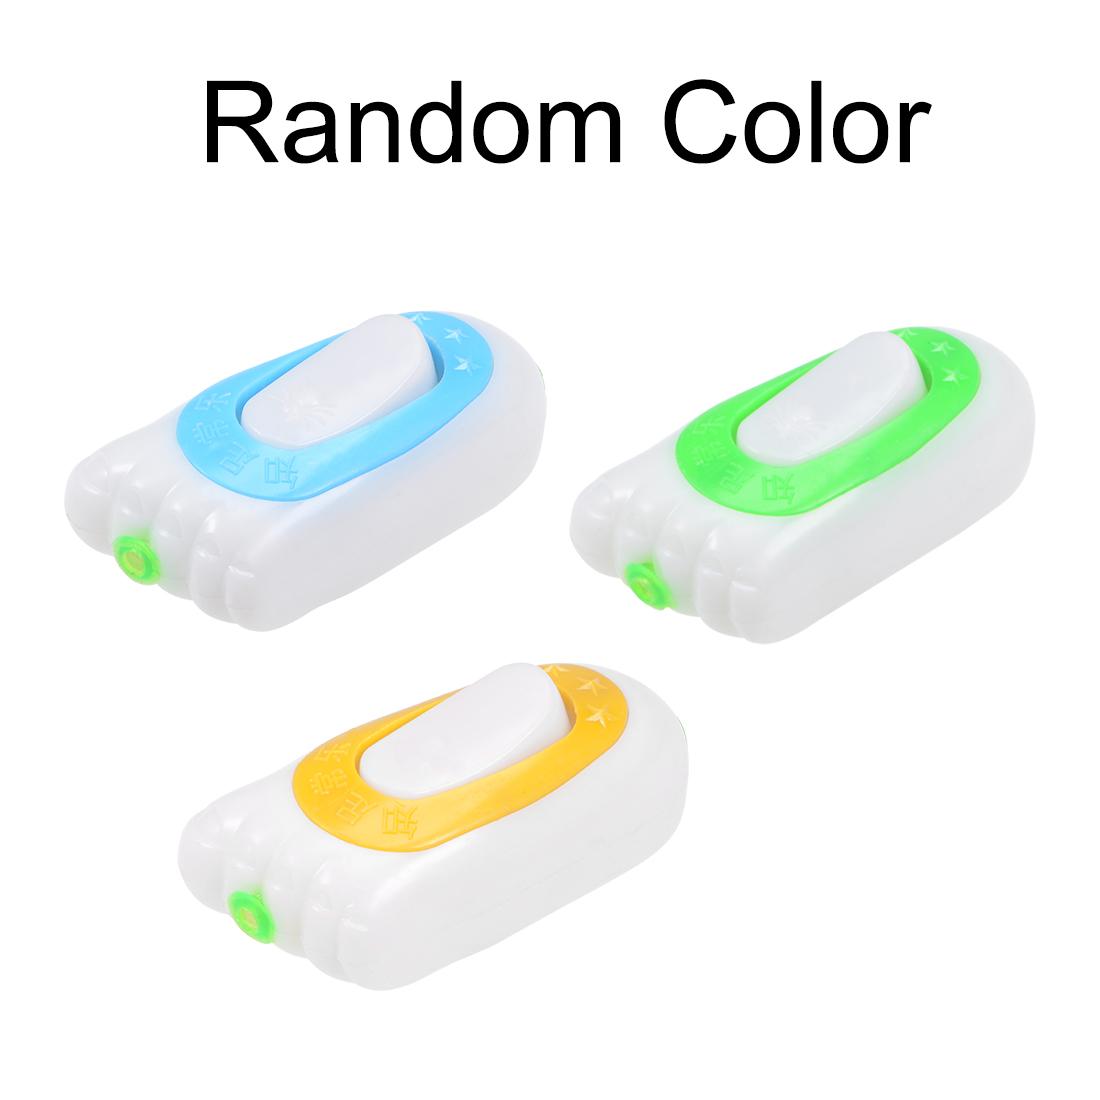 Inline Cord Switch Lamp Light On-Off Rocker Switch AC 250V 16A Random Color 2pcs - image 2 de 4